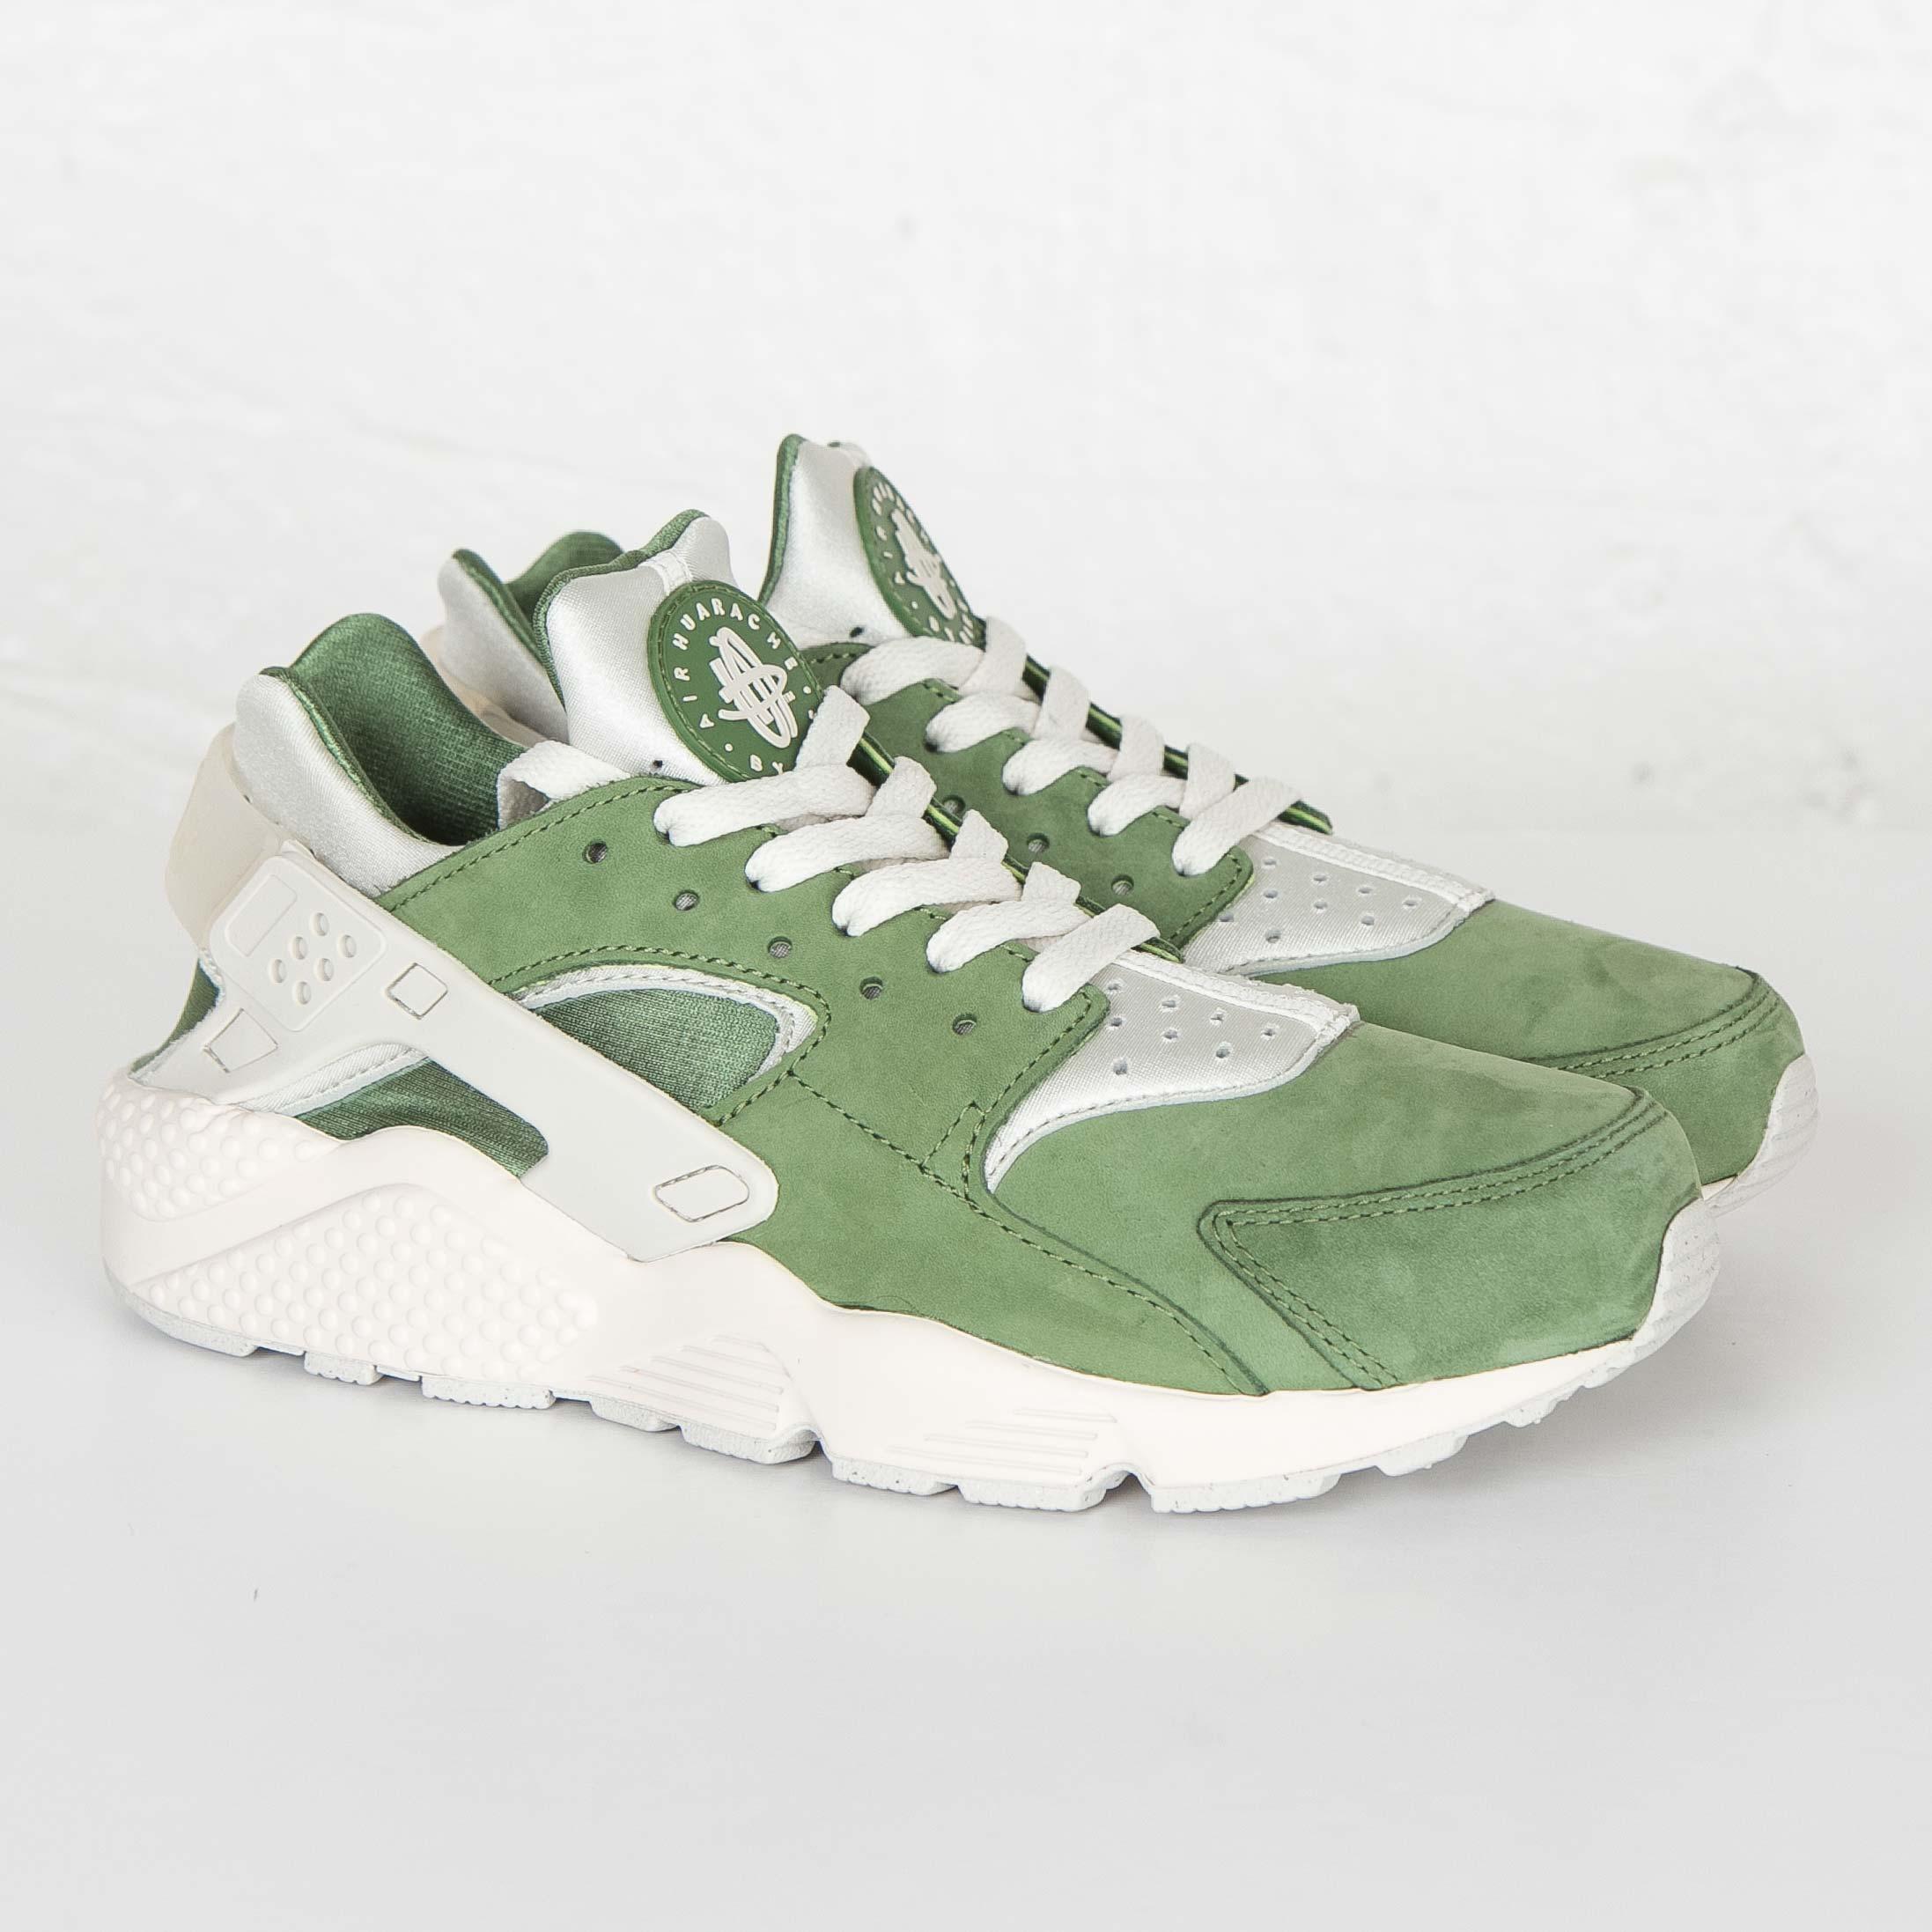 41d5685eeca7 Nike Air Huarache Run Premium - 704830-300 - Sneakersnstuff ...